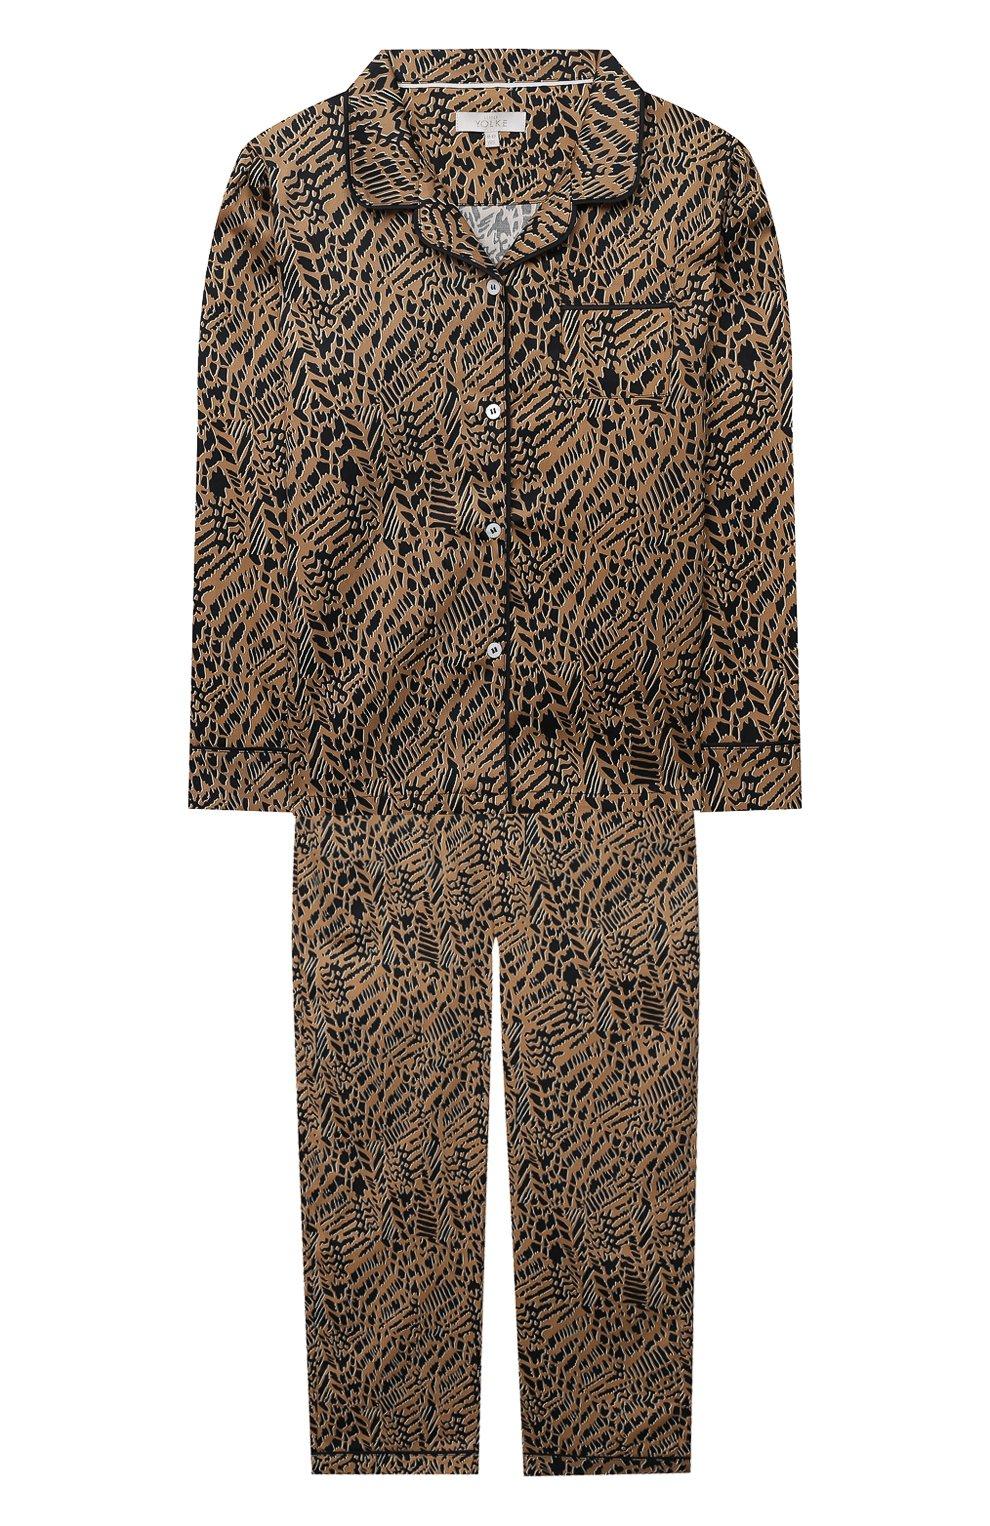 Детская хлопковая пижама LITTLE YOLKE леопардового цвета, арт. SS21-12C-AN-DI/9-12Y | Фото 1